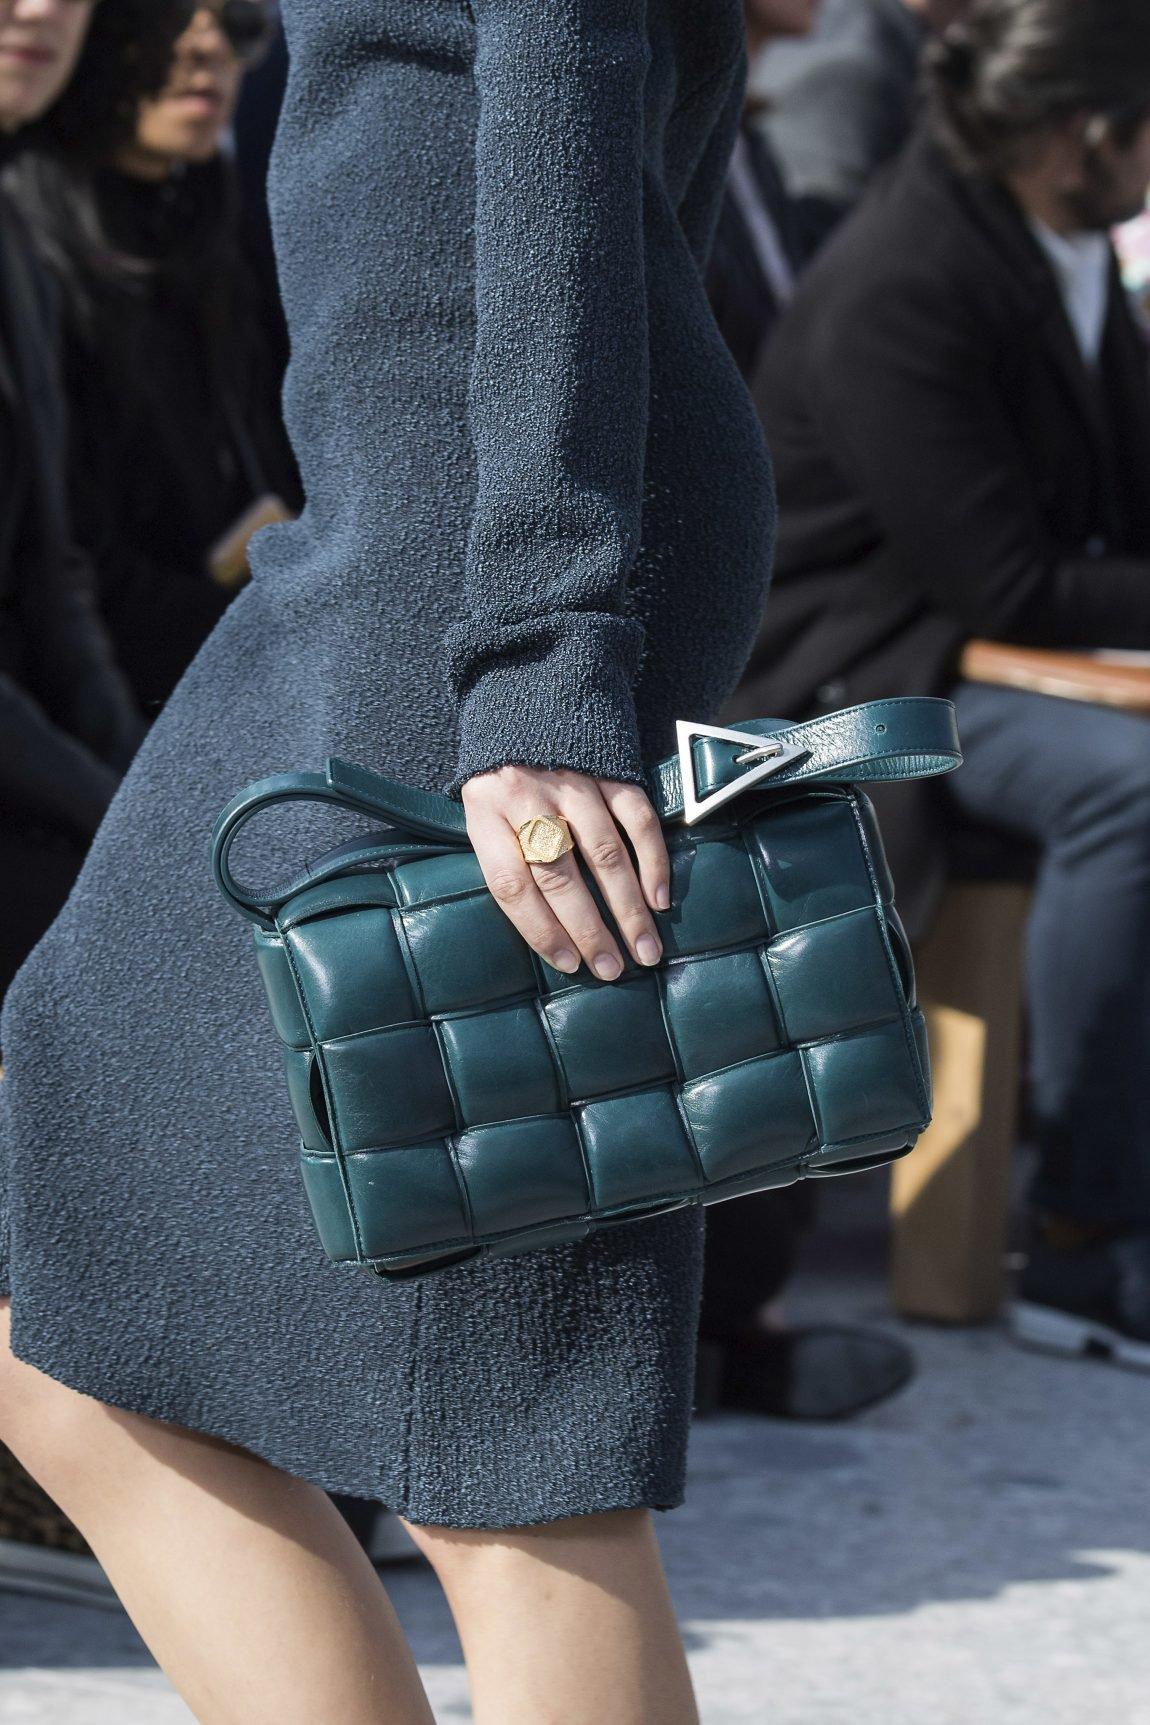 Bottega-Veneta-Blue-Green-Shoulder-Bag-Fall-2019